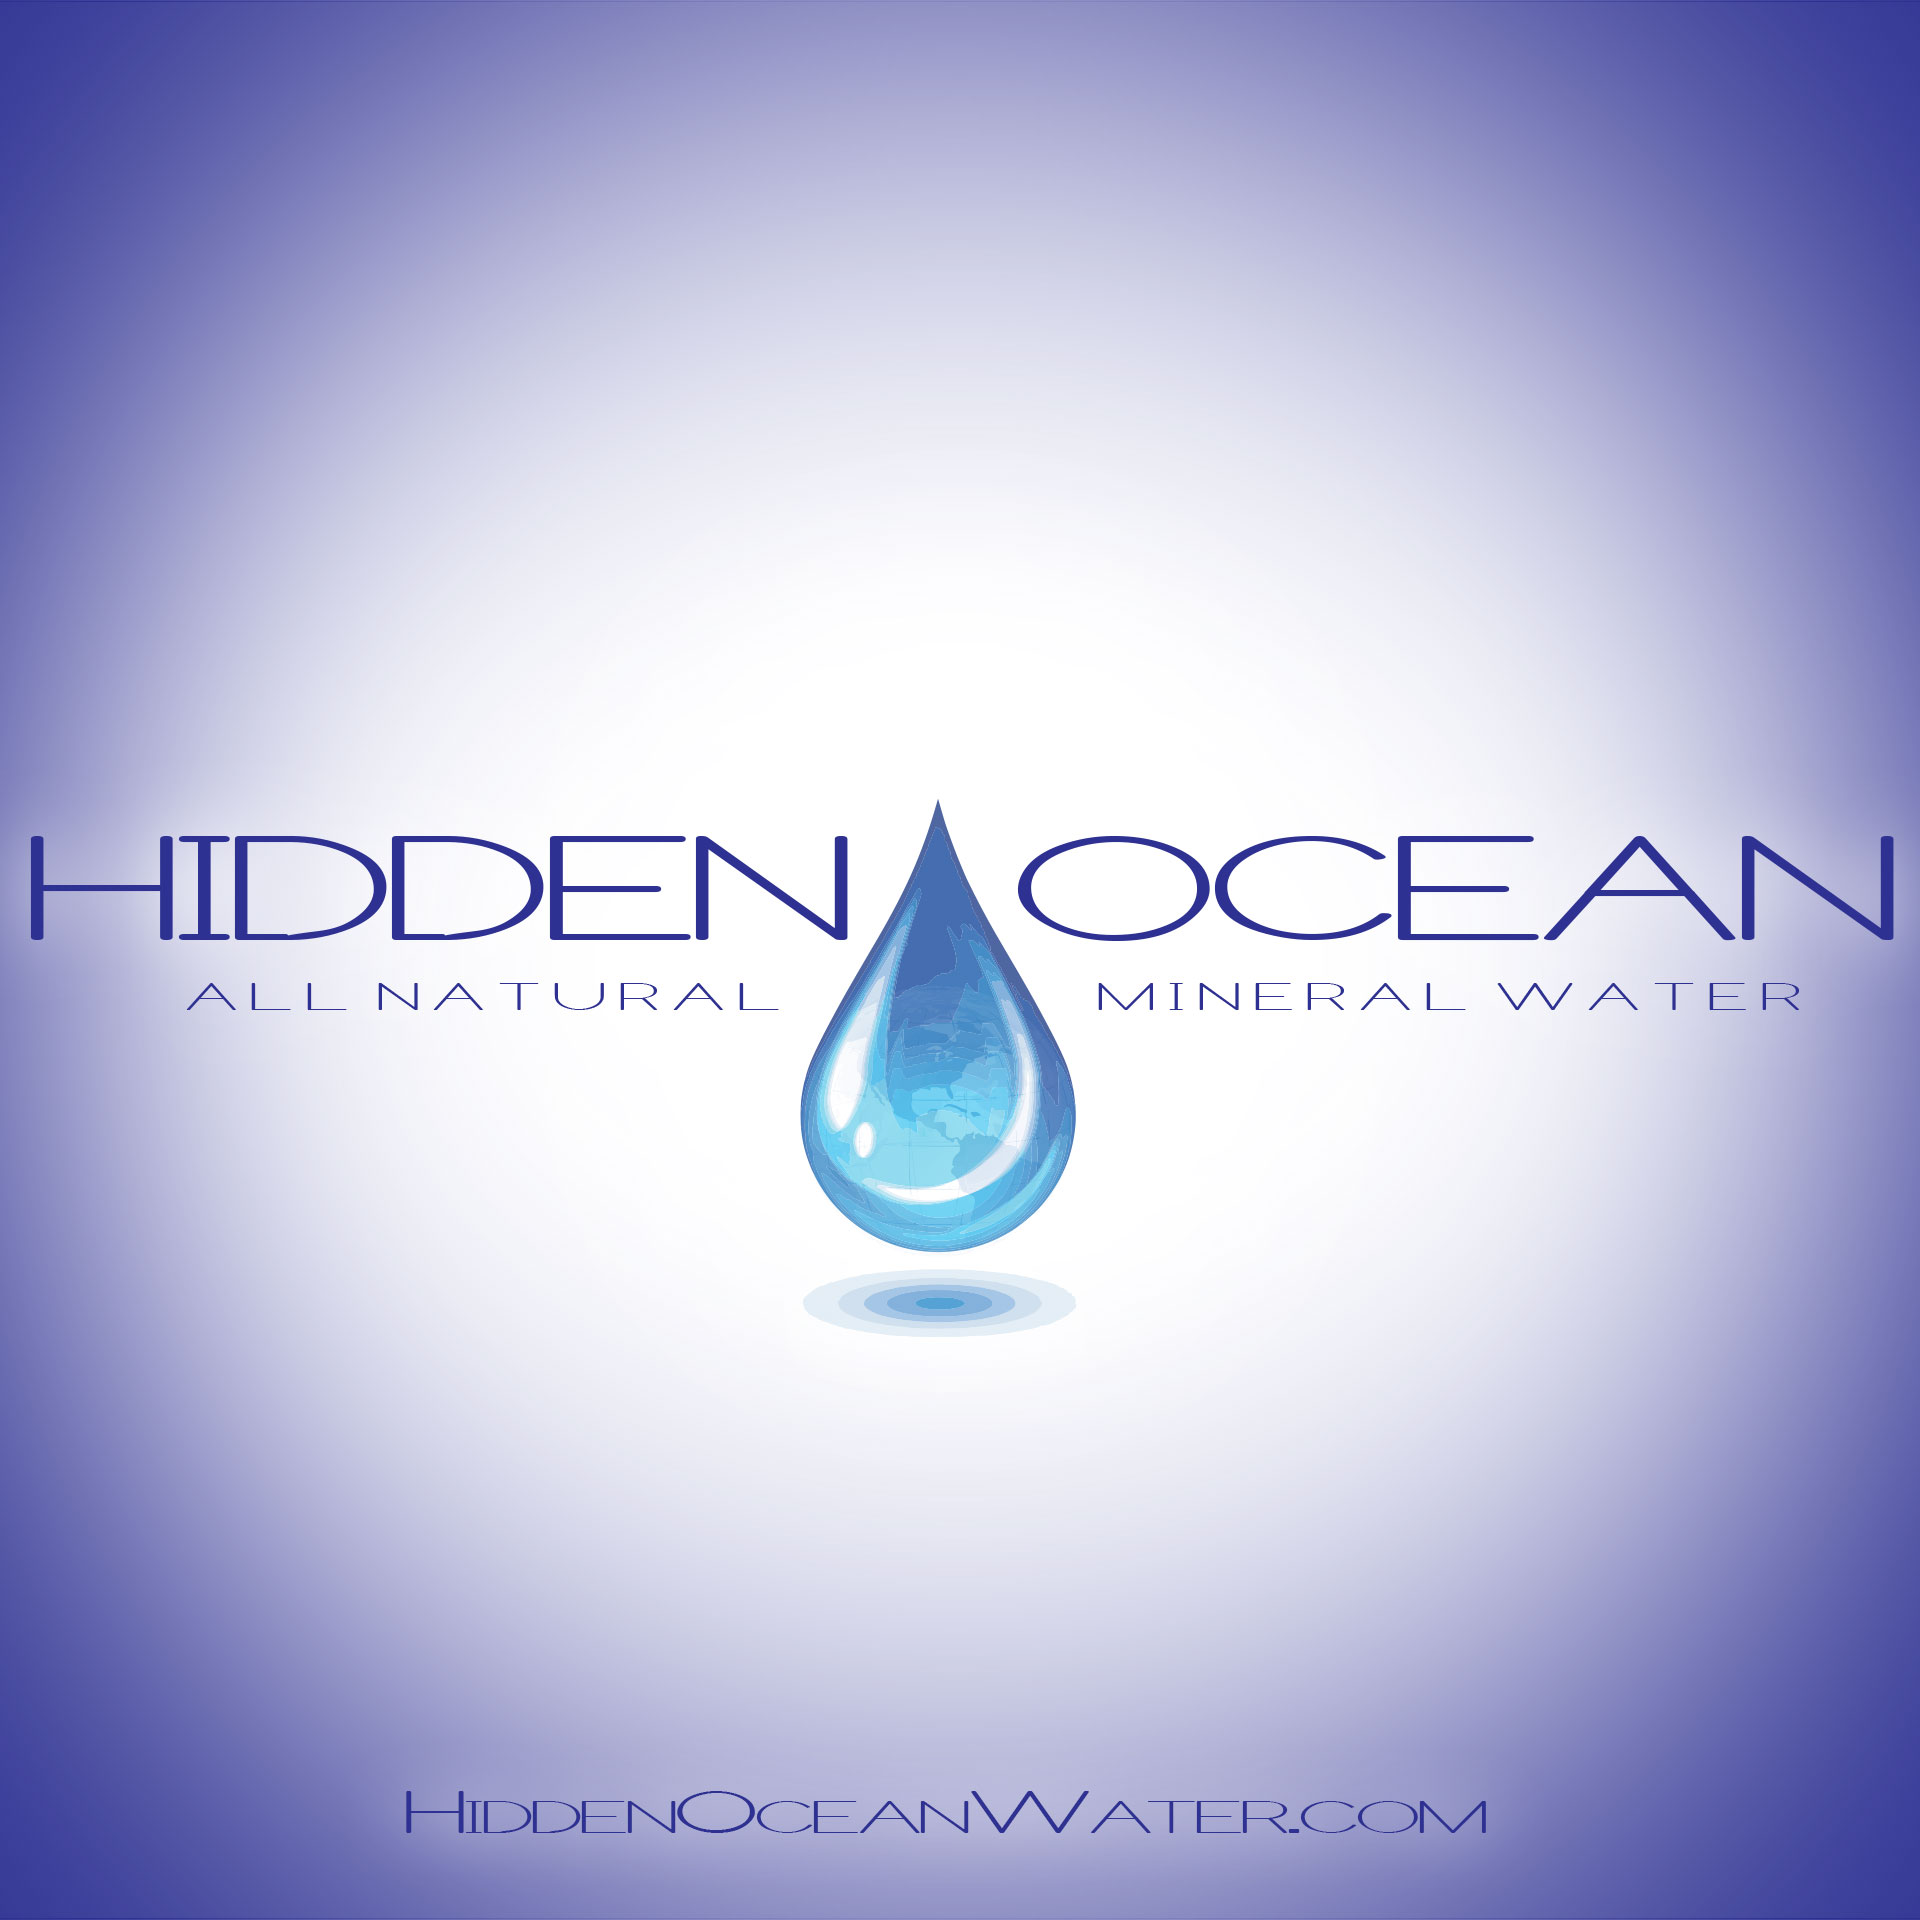 HIDDEN_OCEAN_LOGO